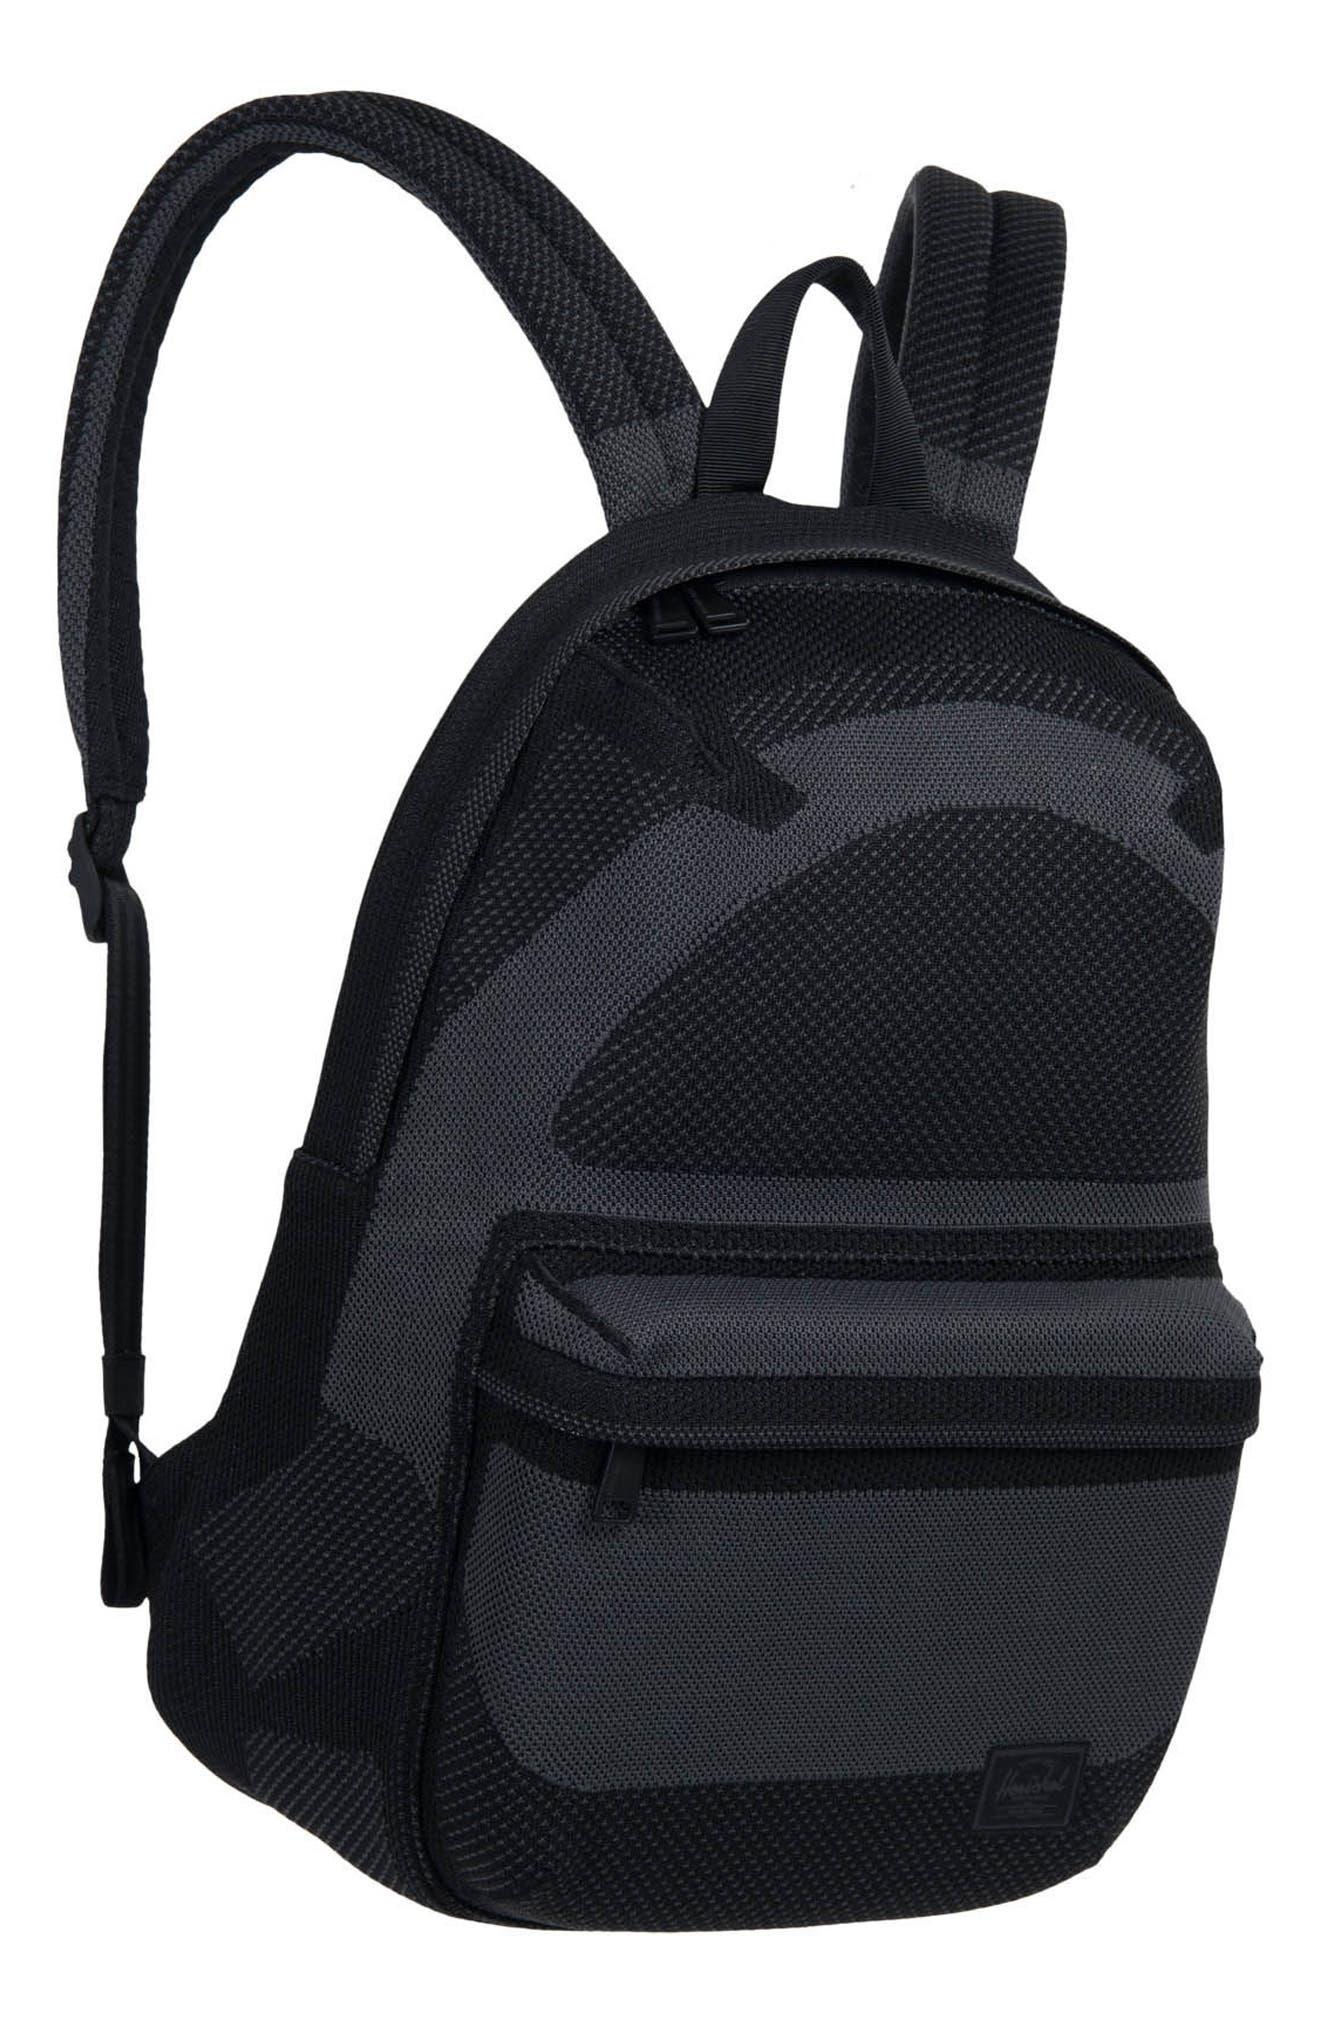 Apex Lawson Backpack,                             Main thumbnail 1, color,                             Black Beauty/ Dark Shadow